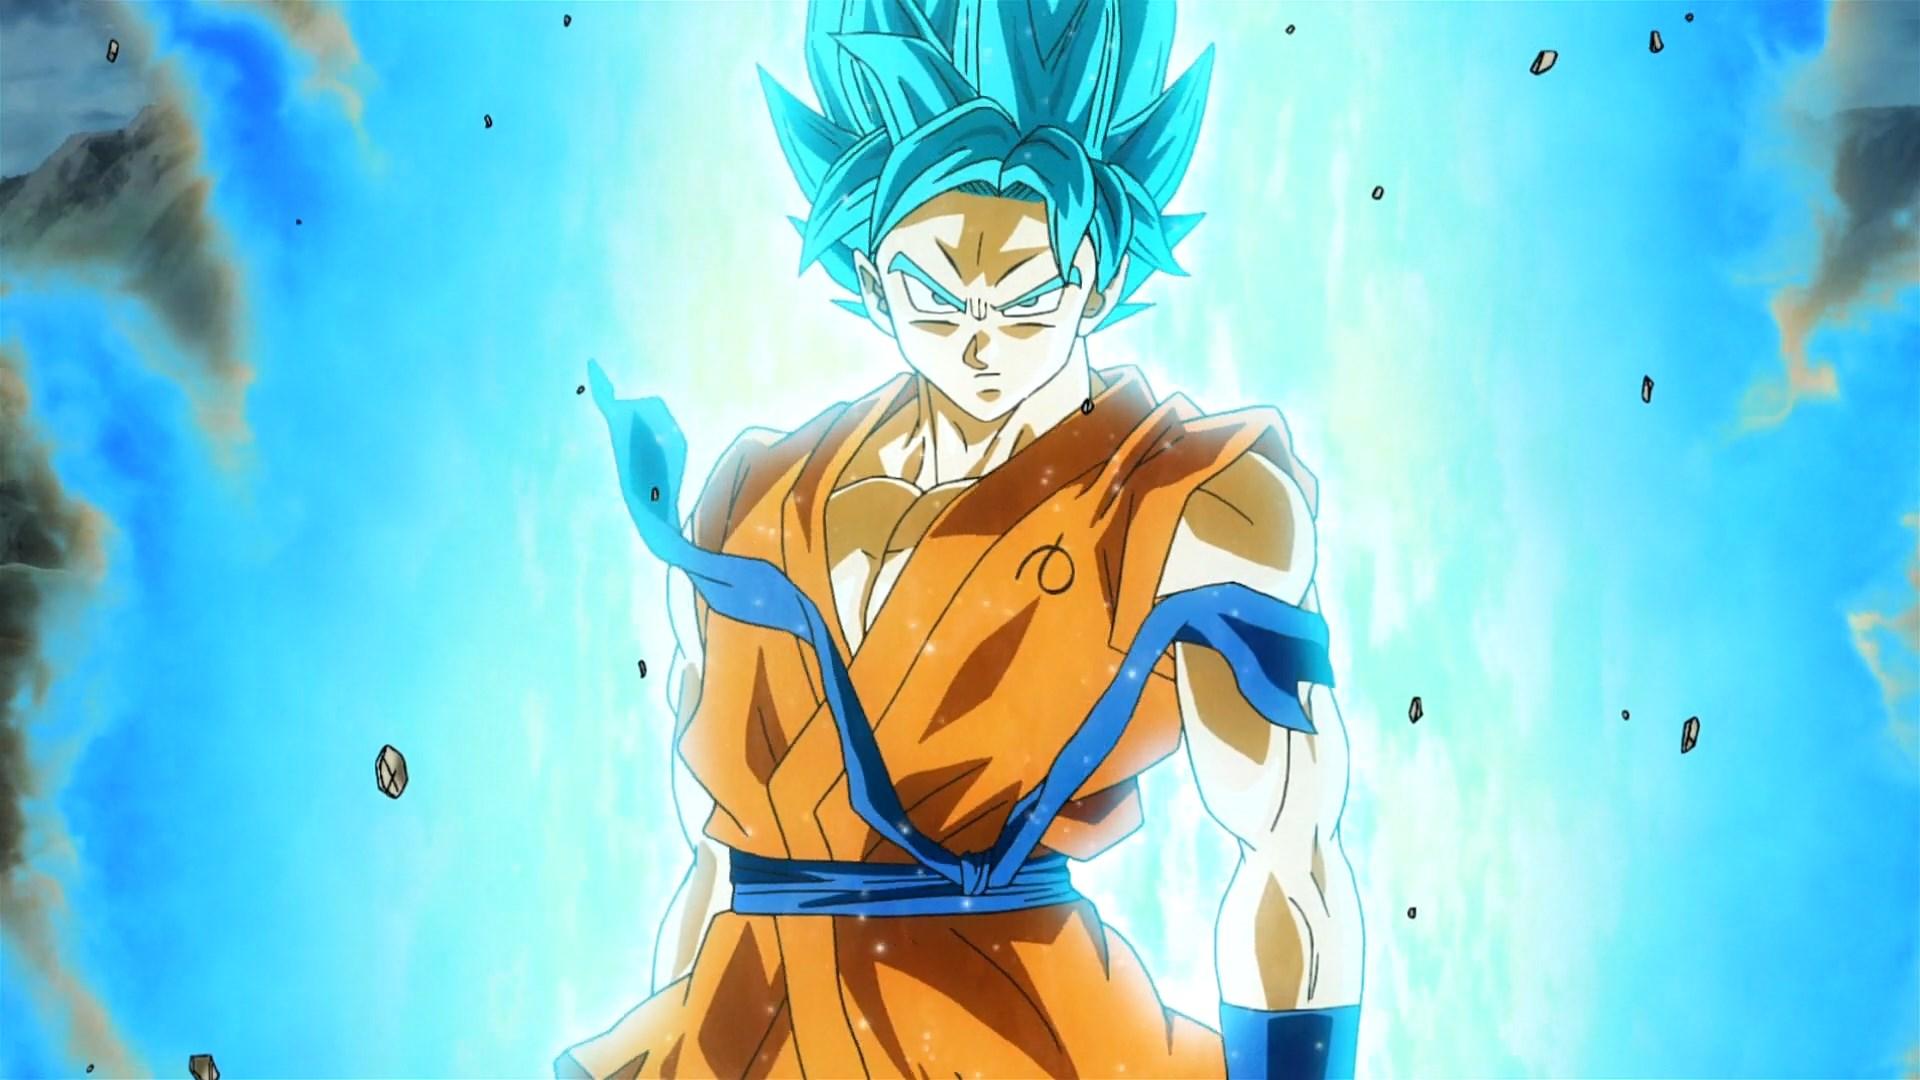 Super Saiyan Saiyajin Blue Goku Ps4wallpapers Com